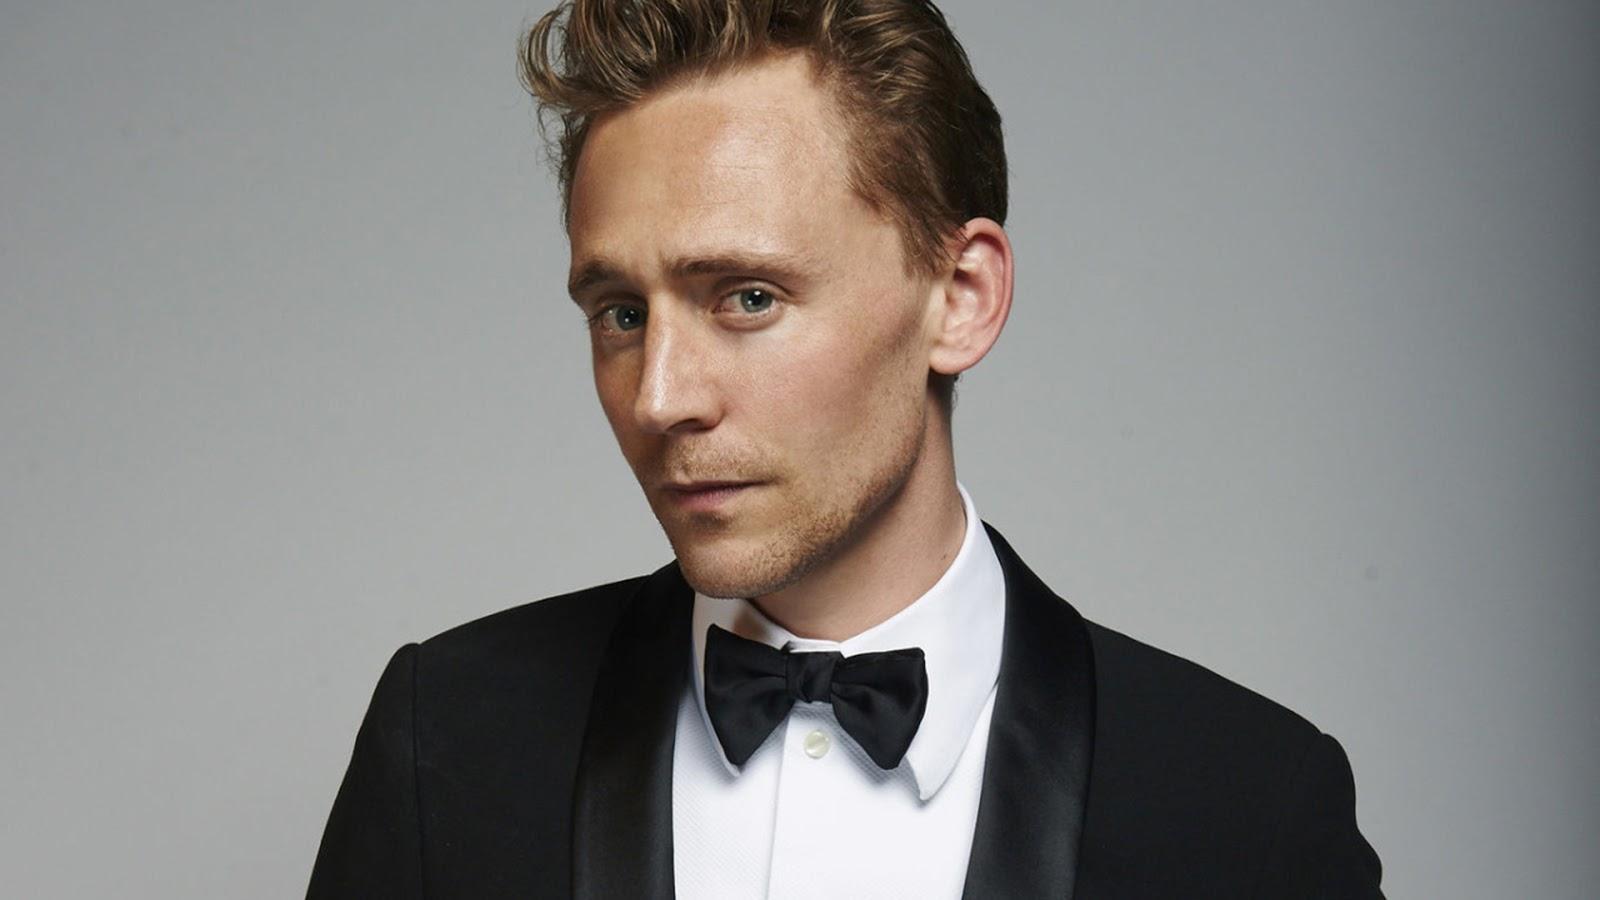 Tom Hiddleston se rehusa a hablar de Taylor Swift